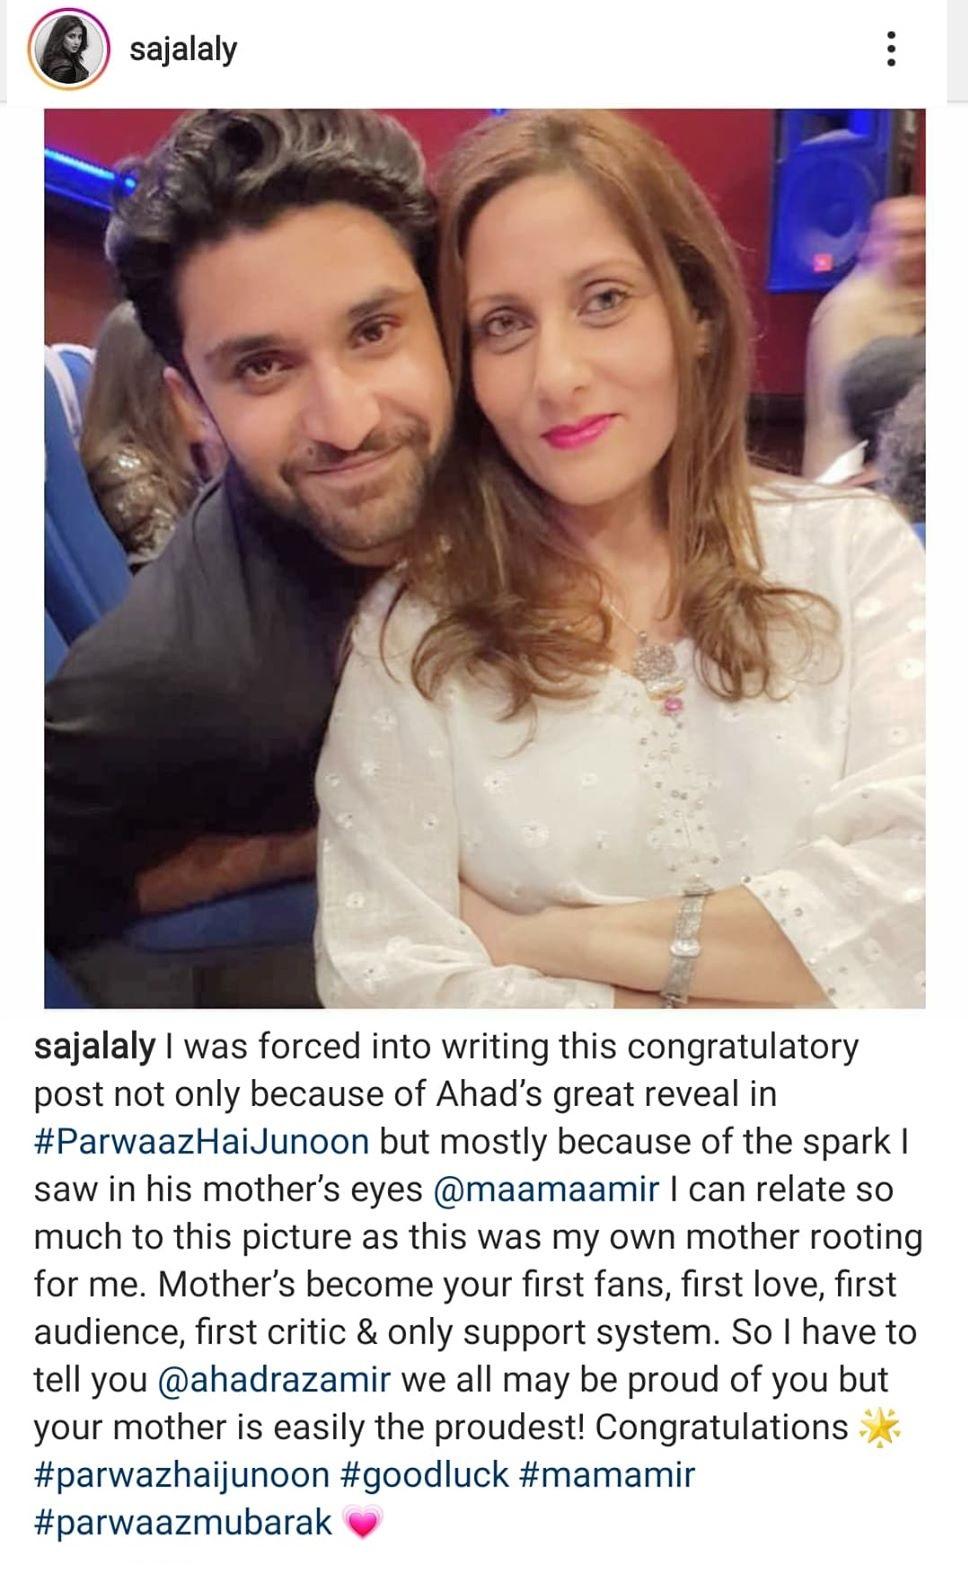 10 Times Sajal Aly Complimented Ahad Raza Mir